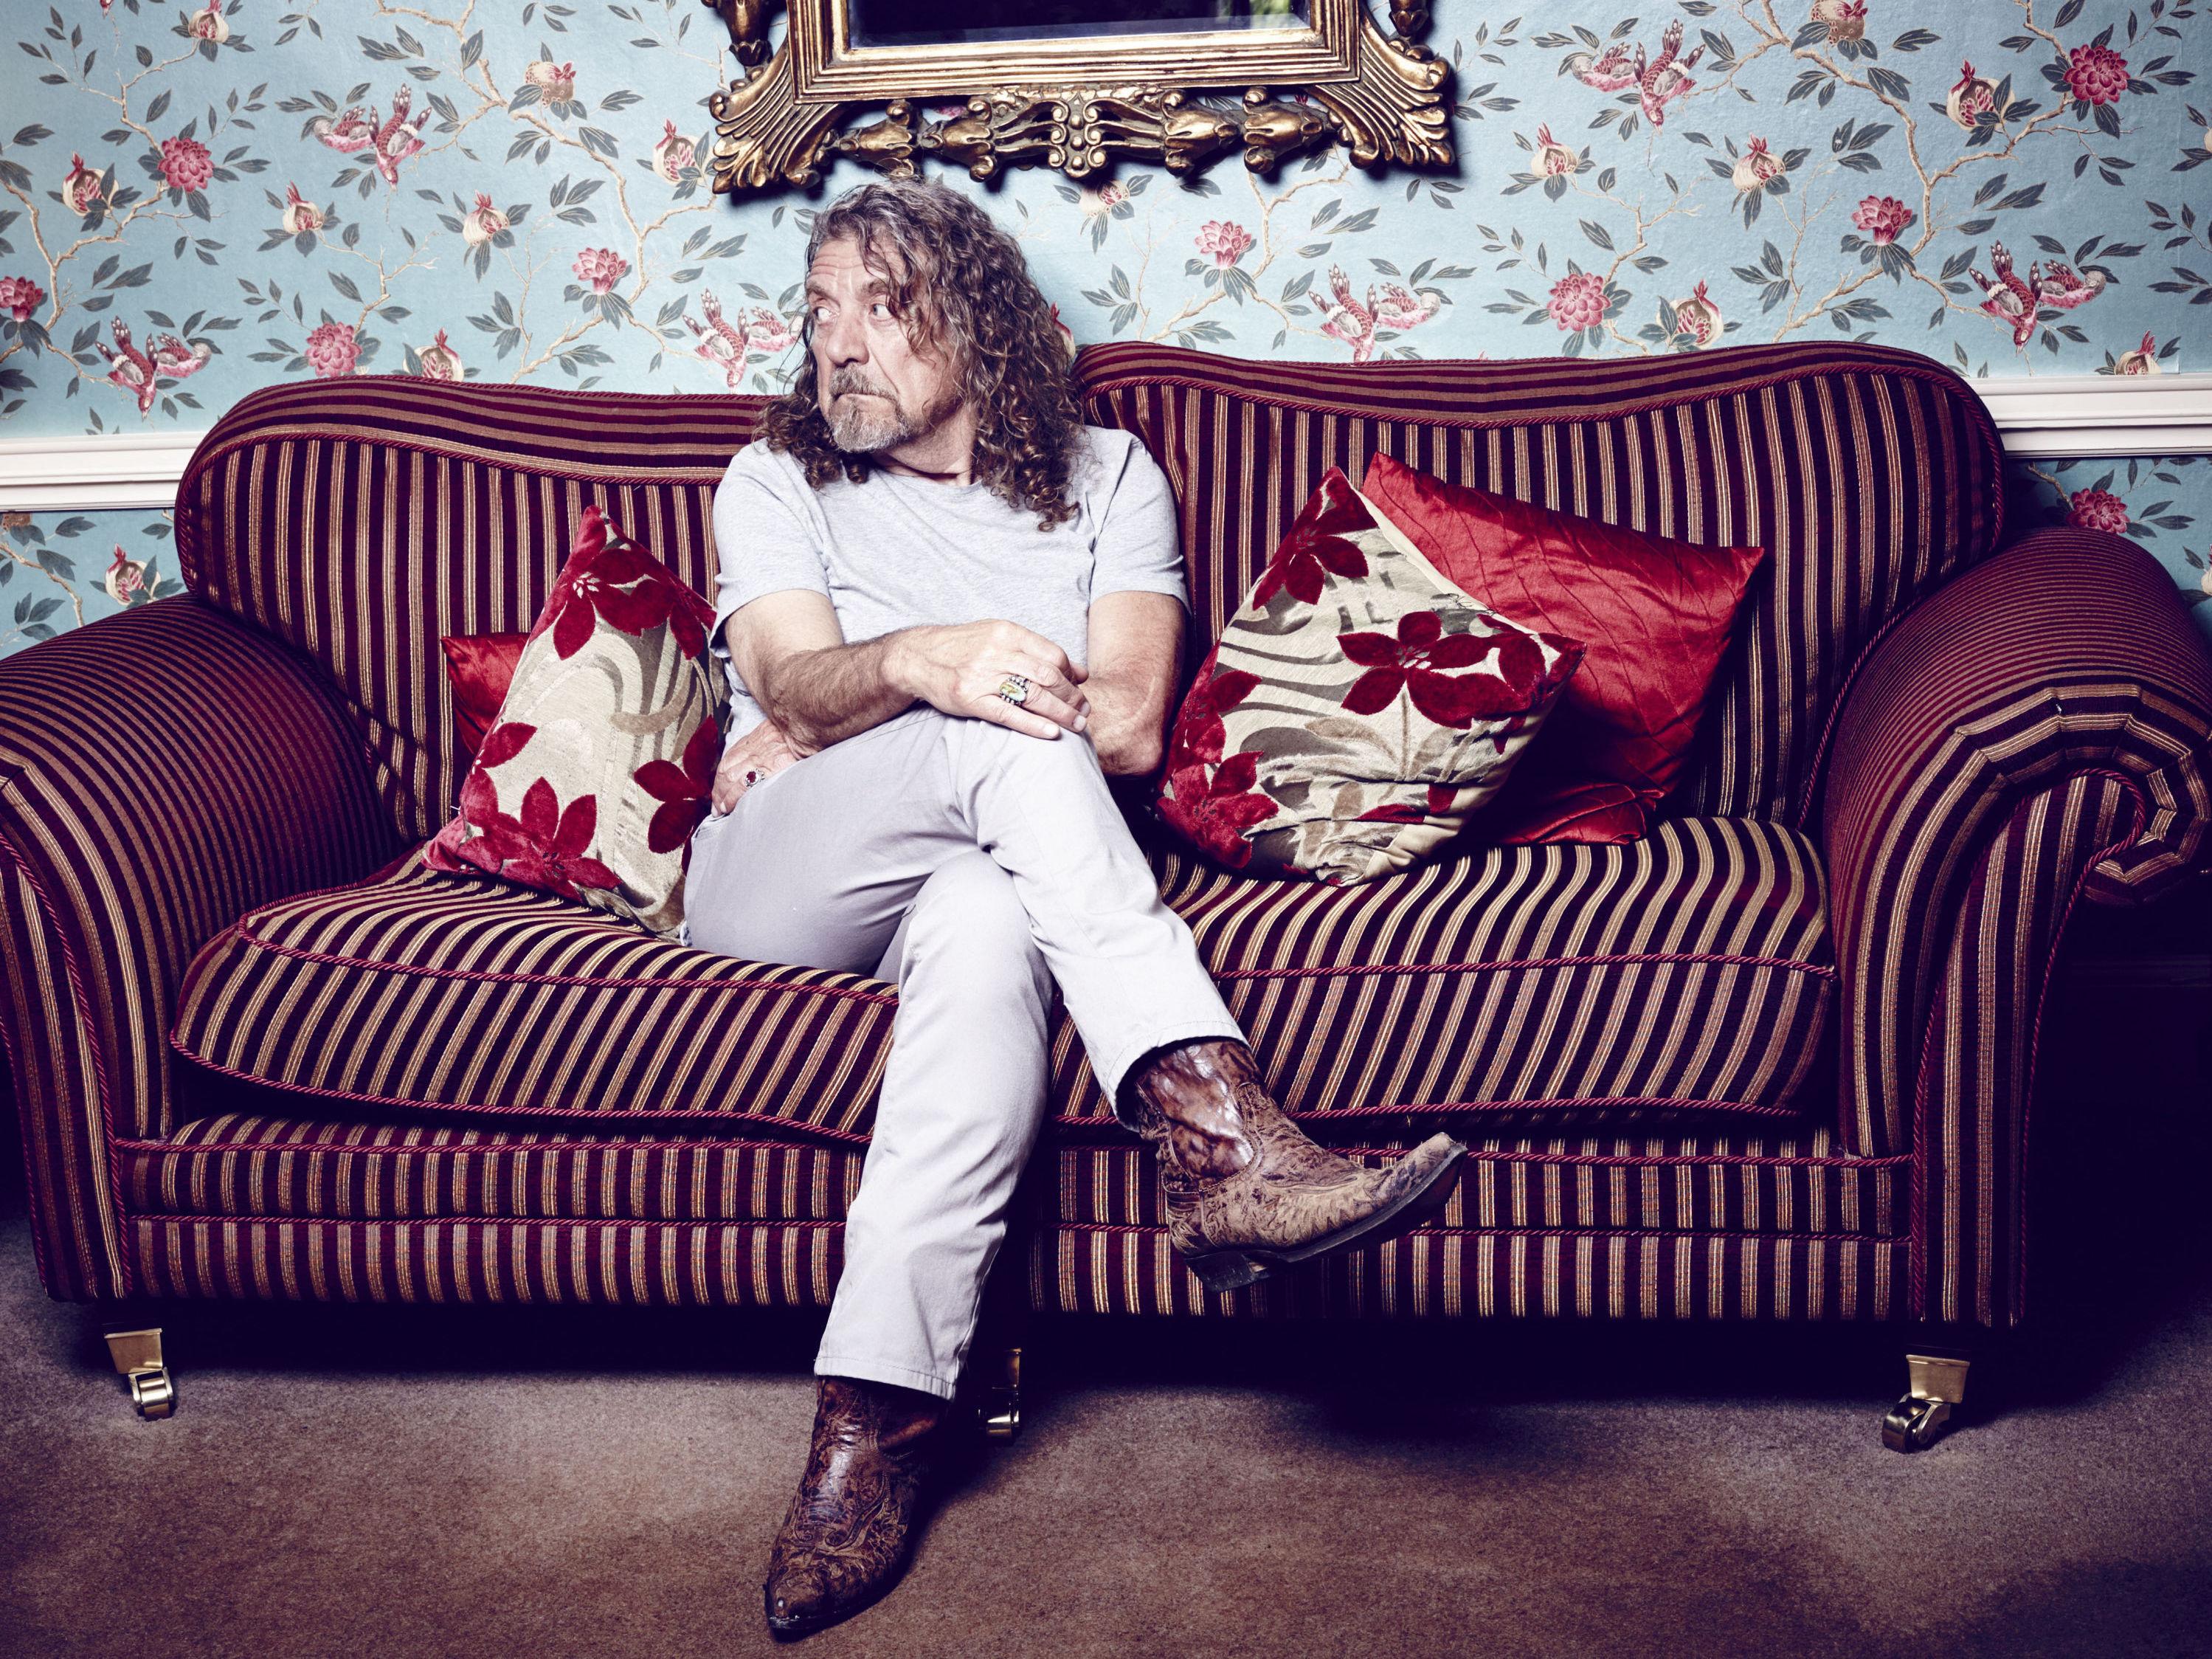 First Listen: Robert Plant, 'Lullaby And... The Ceaseless Roar'